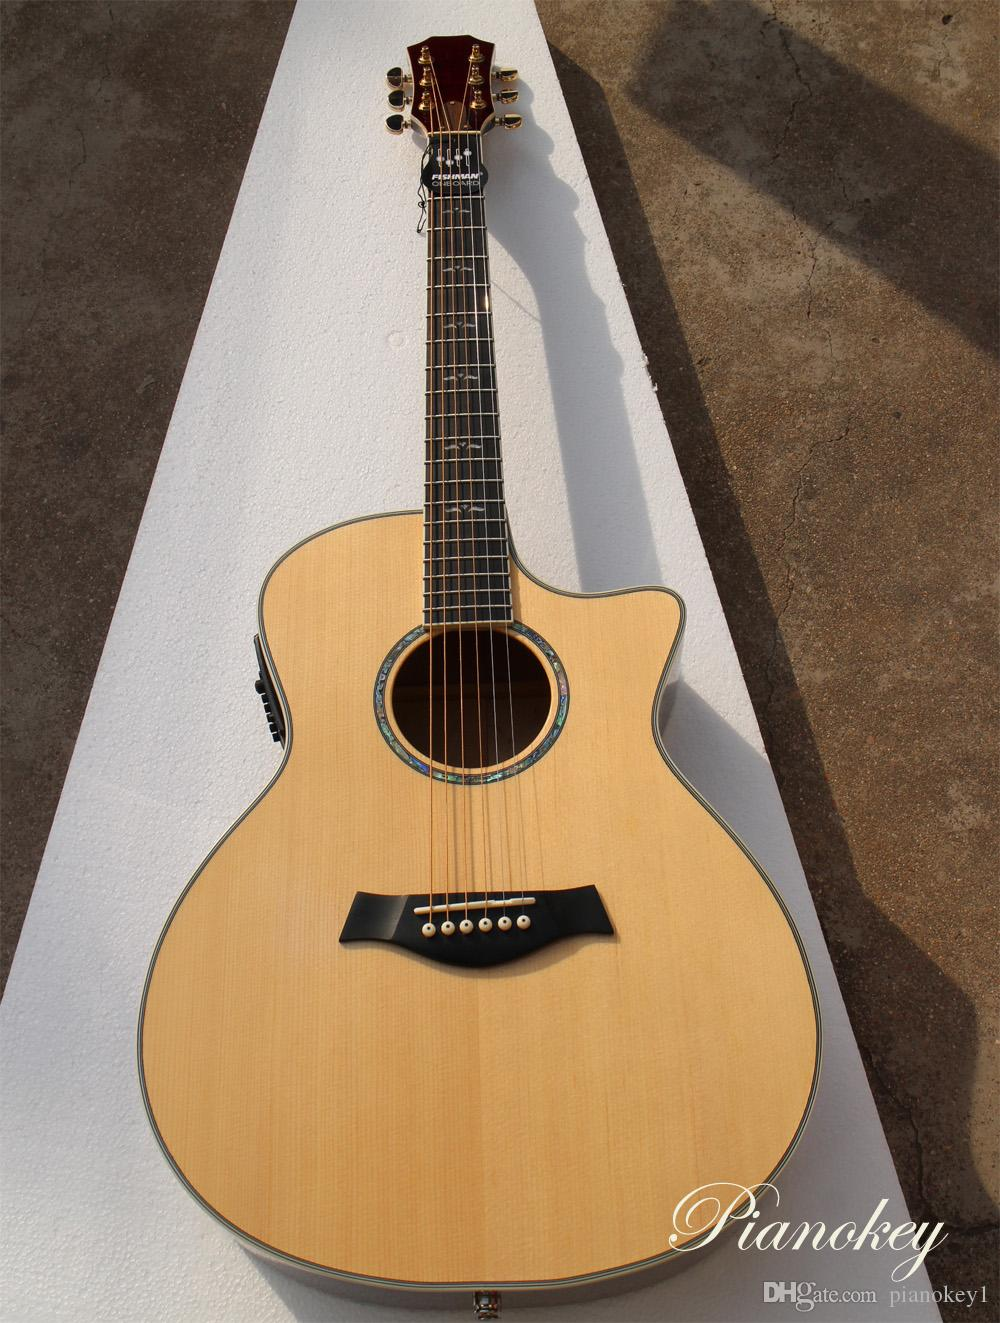 41 Inch Transparent Wood Color Cut Away Guitar Acoustic Customize